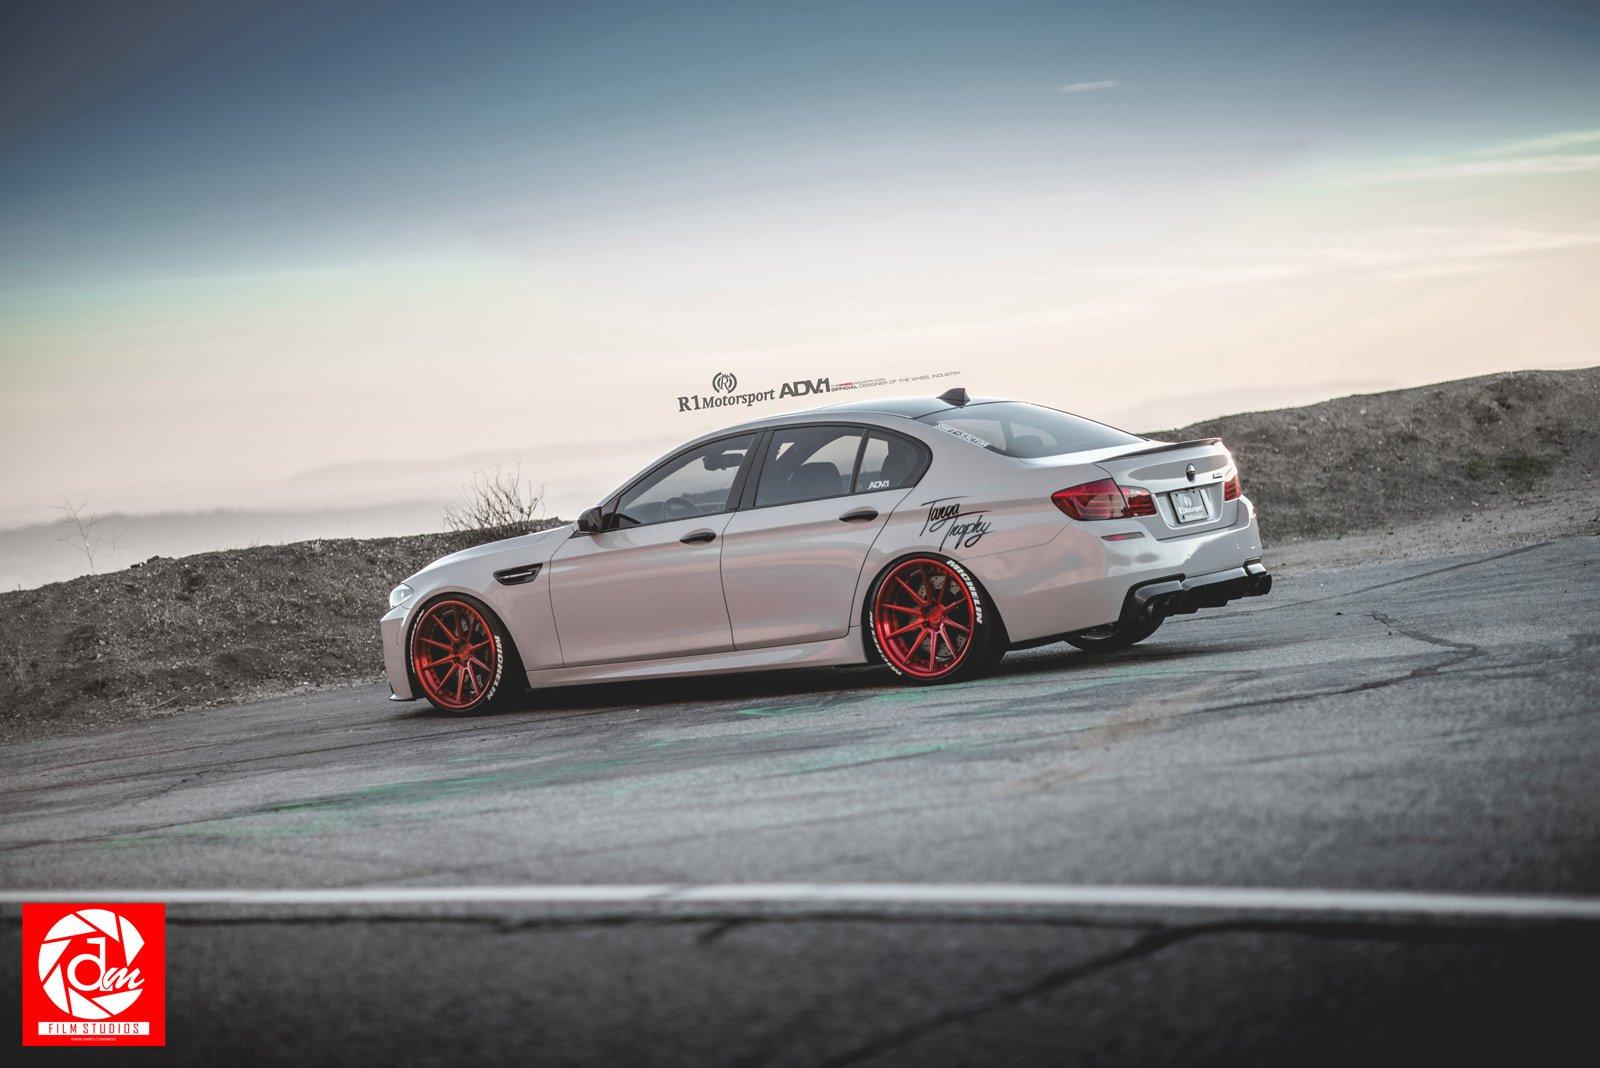 2015_adv1_wheels_bmw_m5_f10_cars_coupe_tuning_1600x1068.jpg